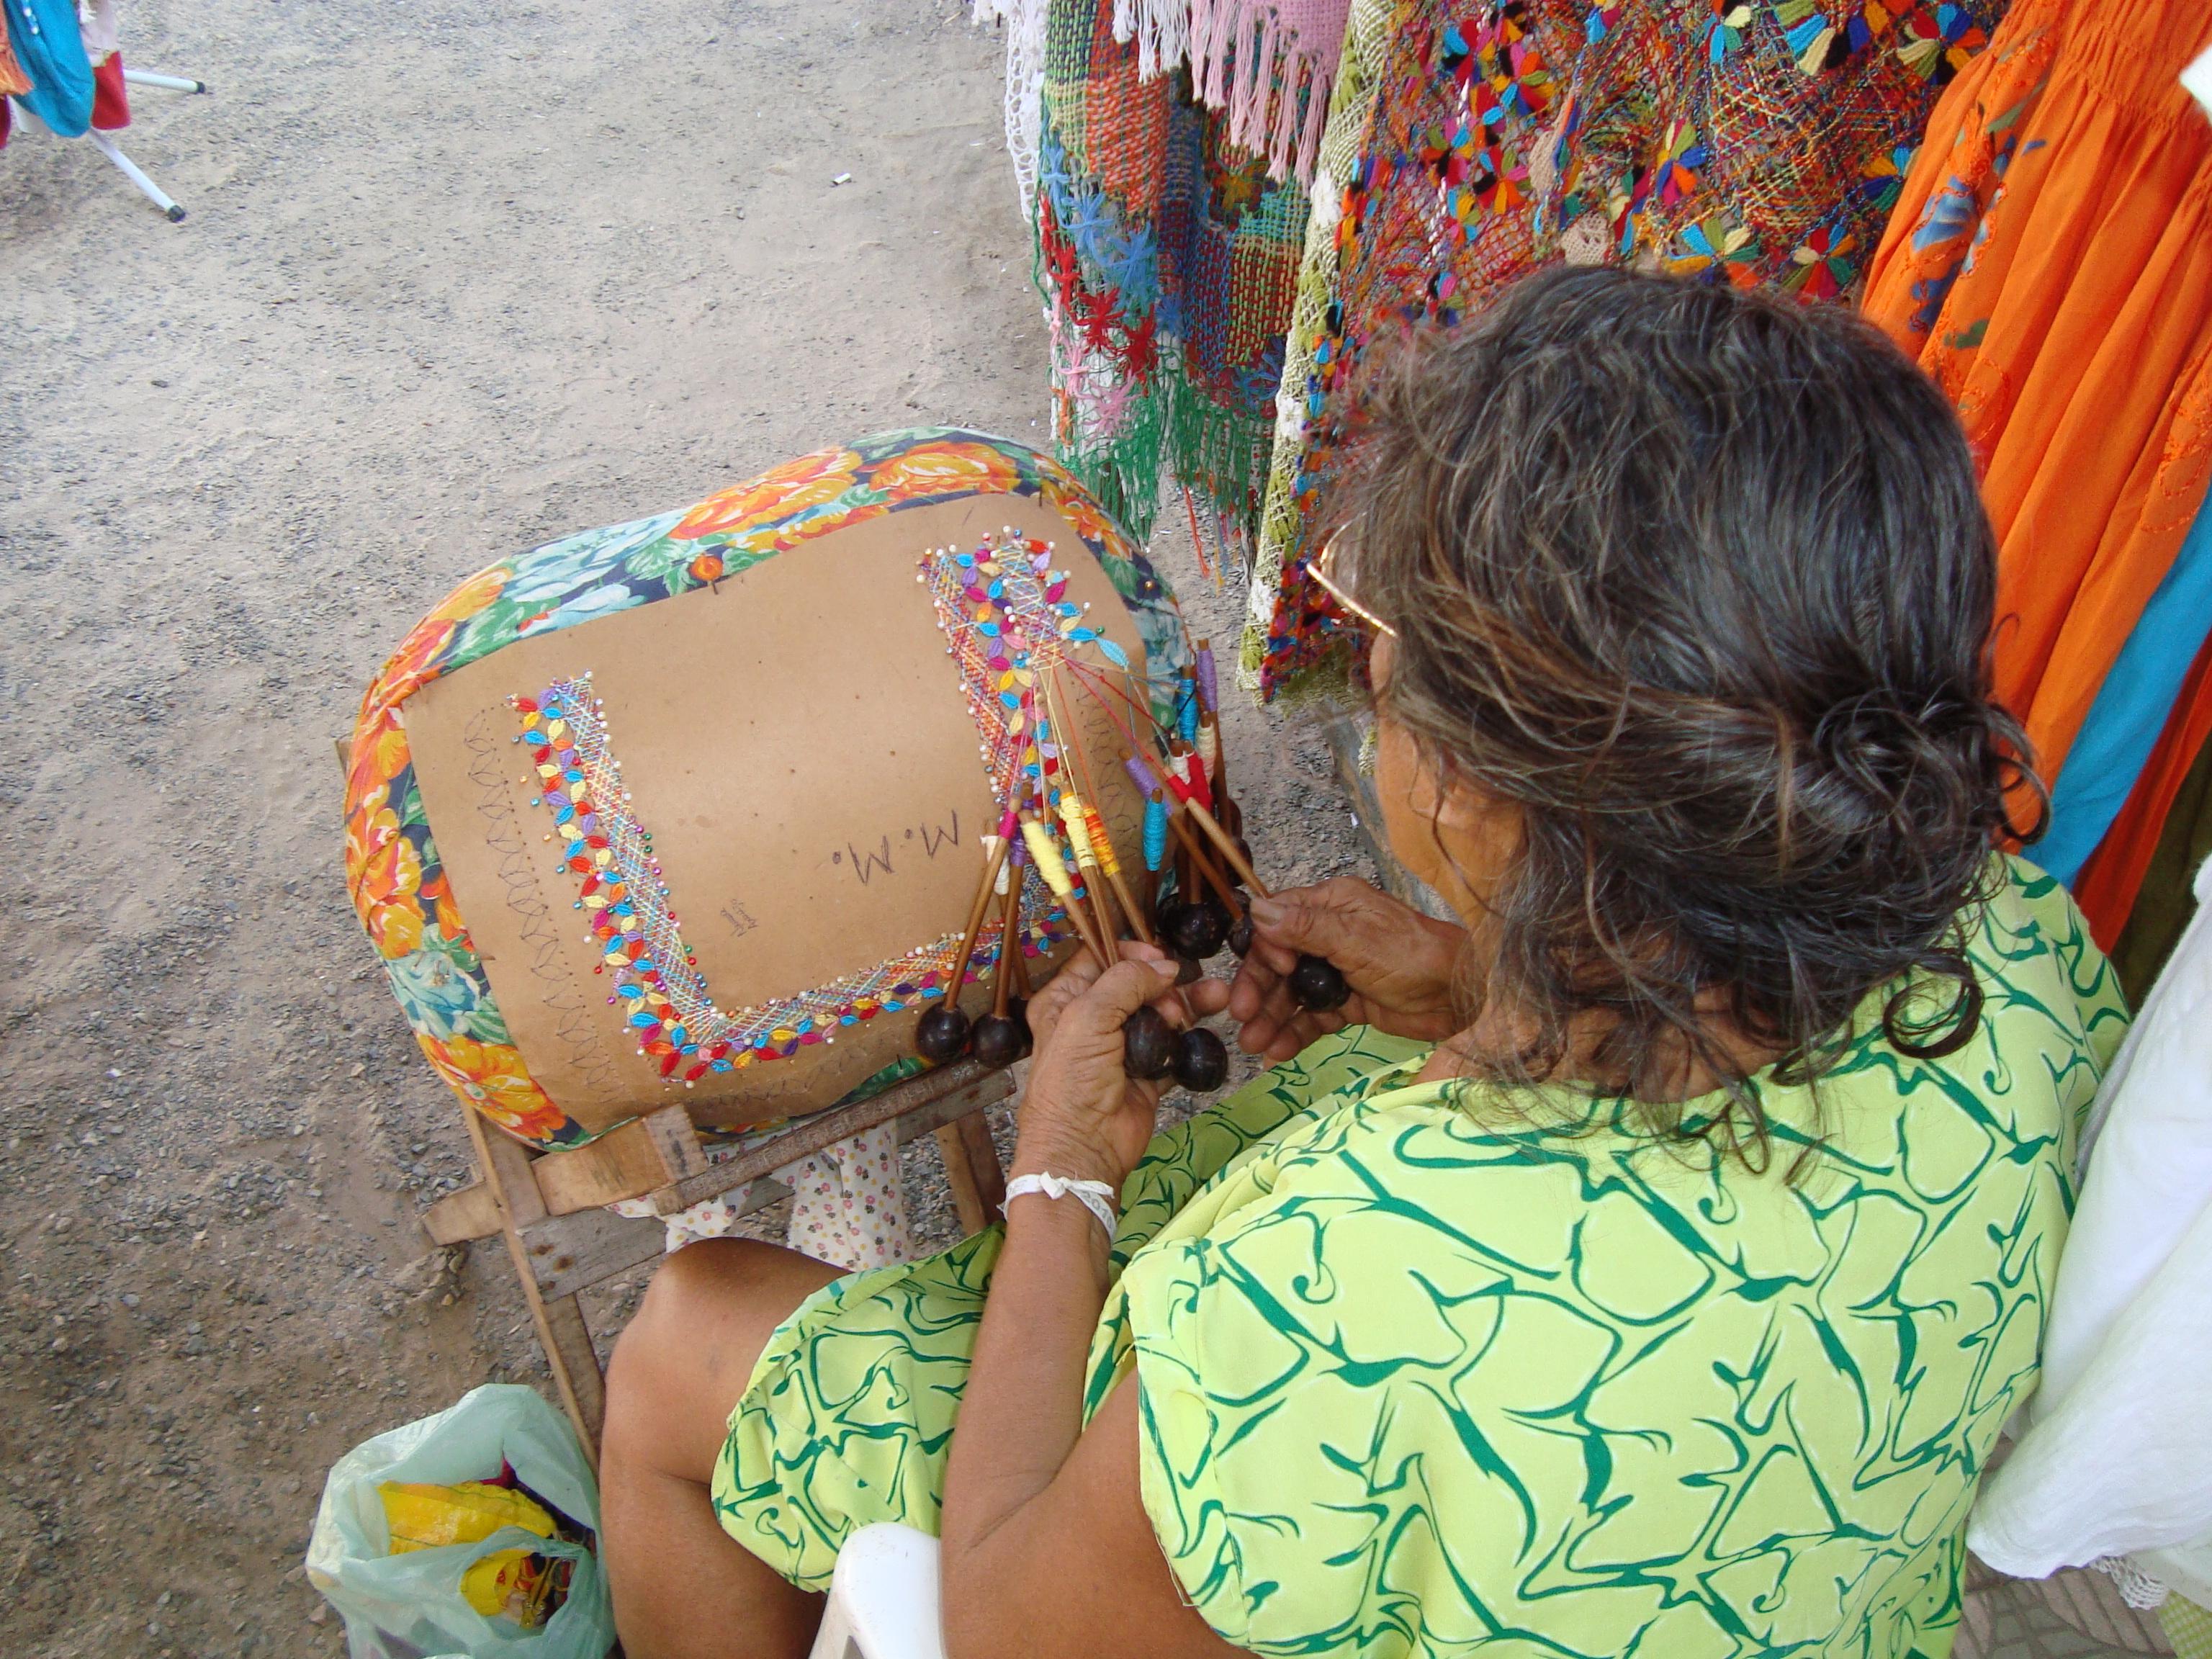 Adesivo Para Geladeira Retro ~ Mulheres Rendeiras Blog da Deia